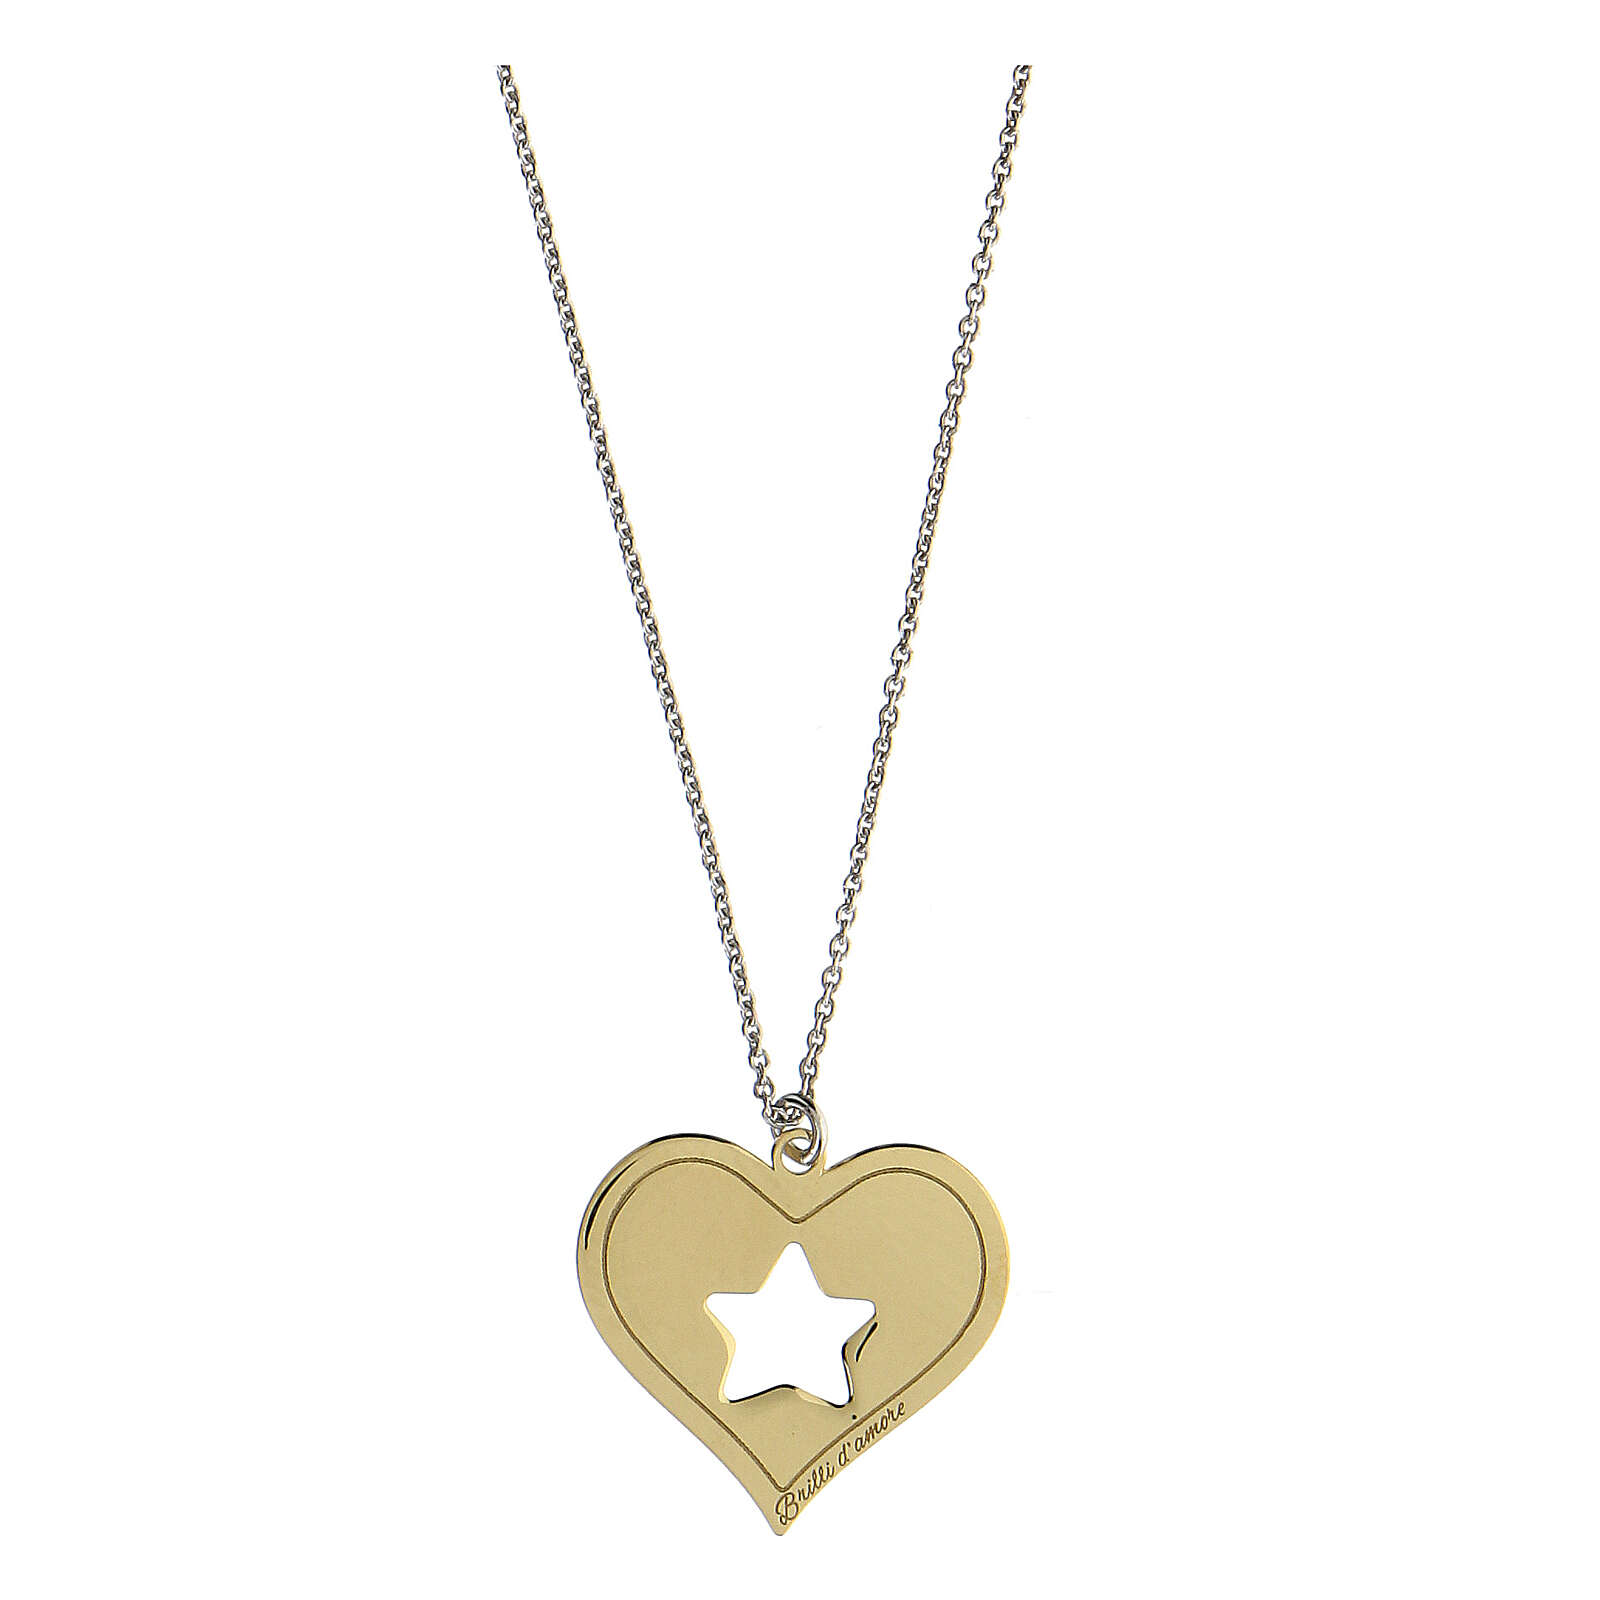 Collar Brilli Amore corazón estrella plata 925 dorada 4